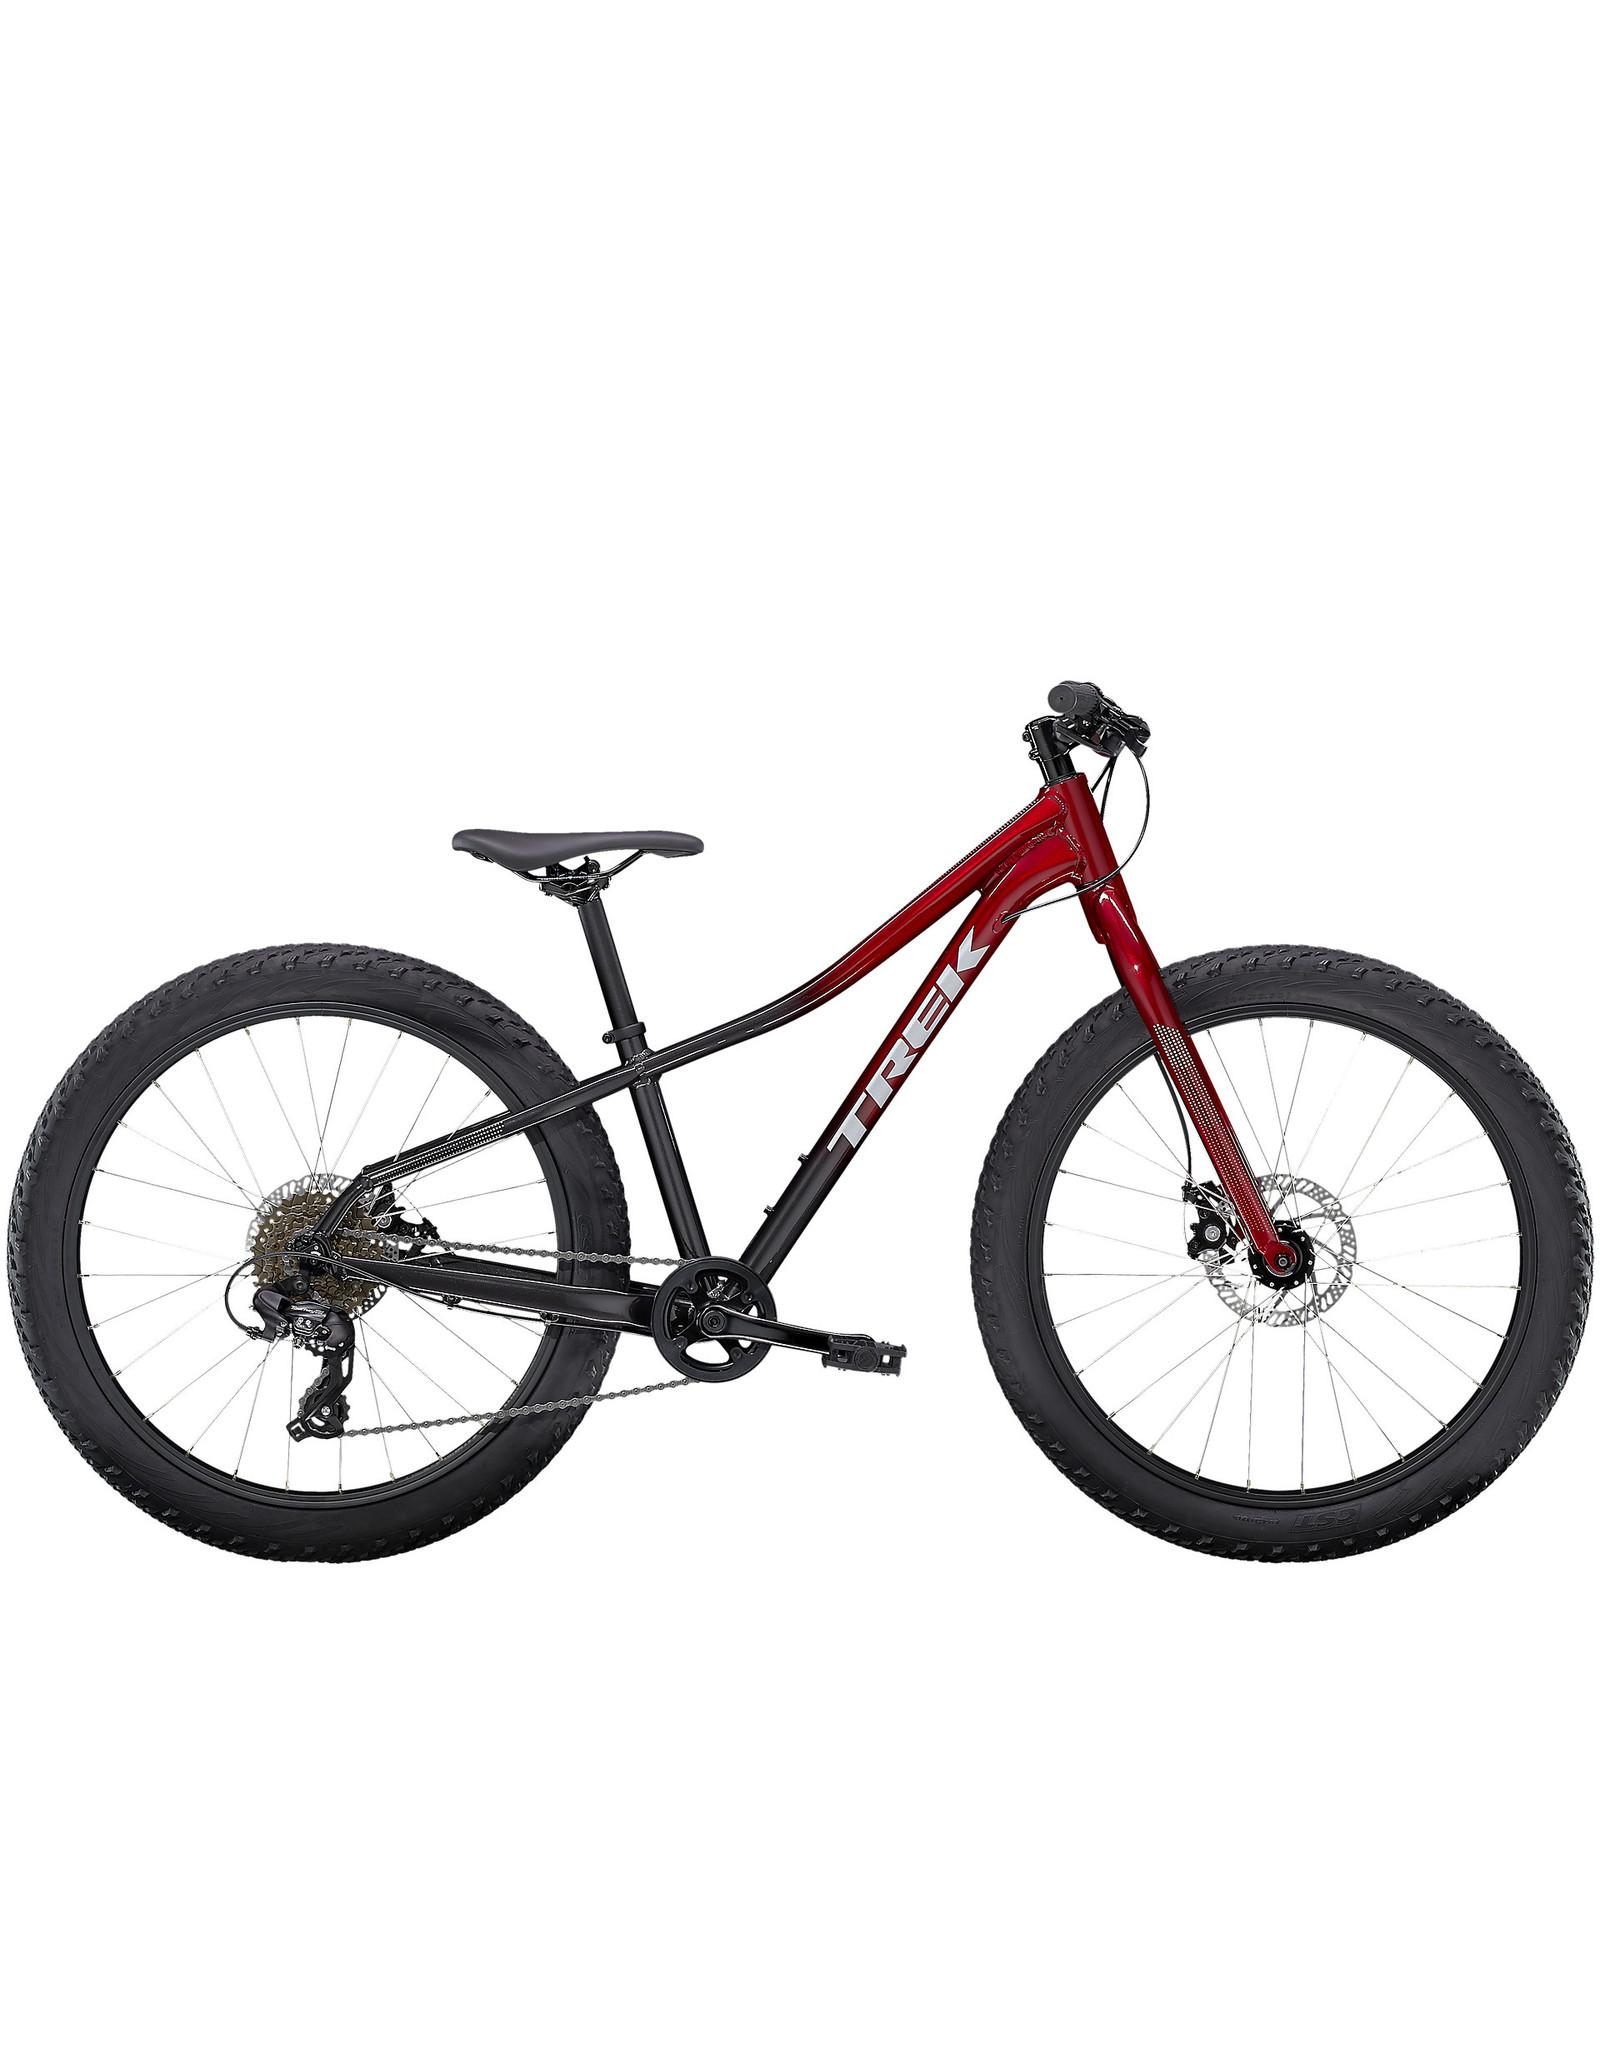 Trek Bike: 2021 Trek Roscoe 24 8 Speed Black